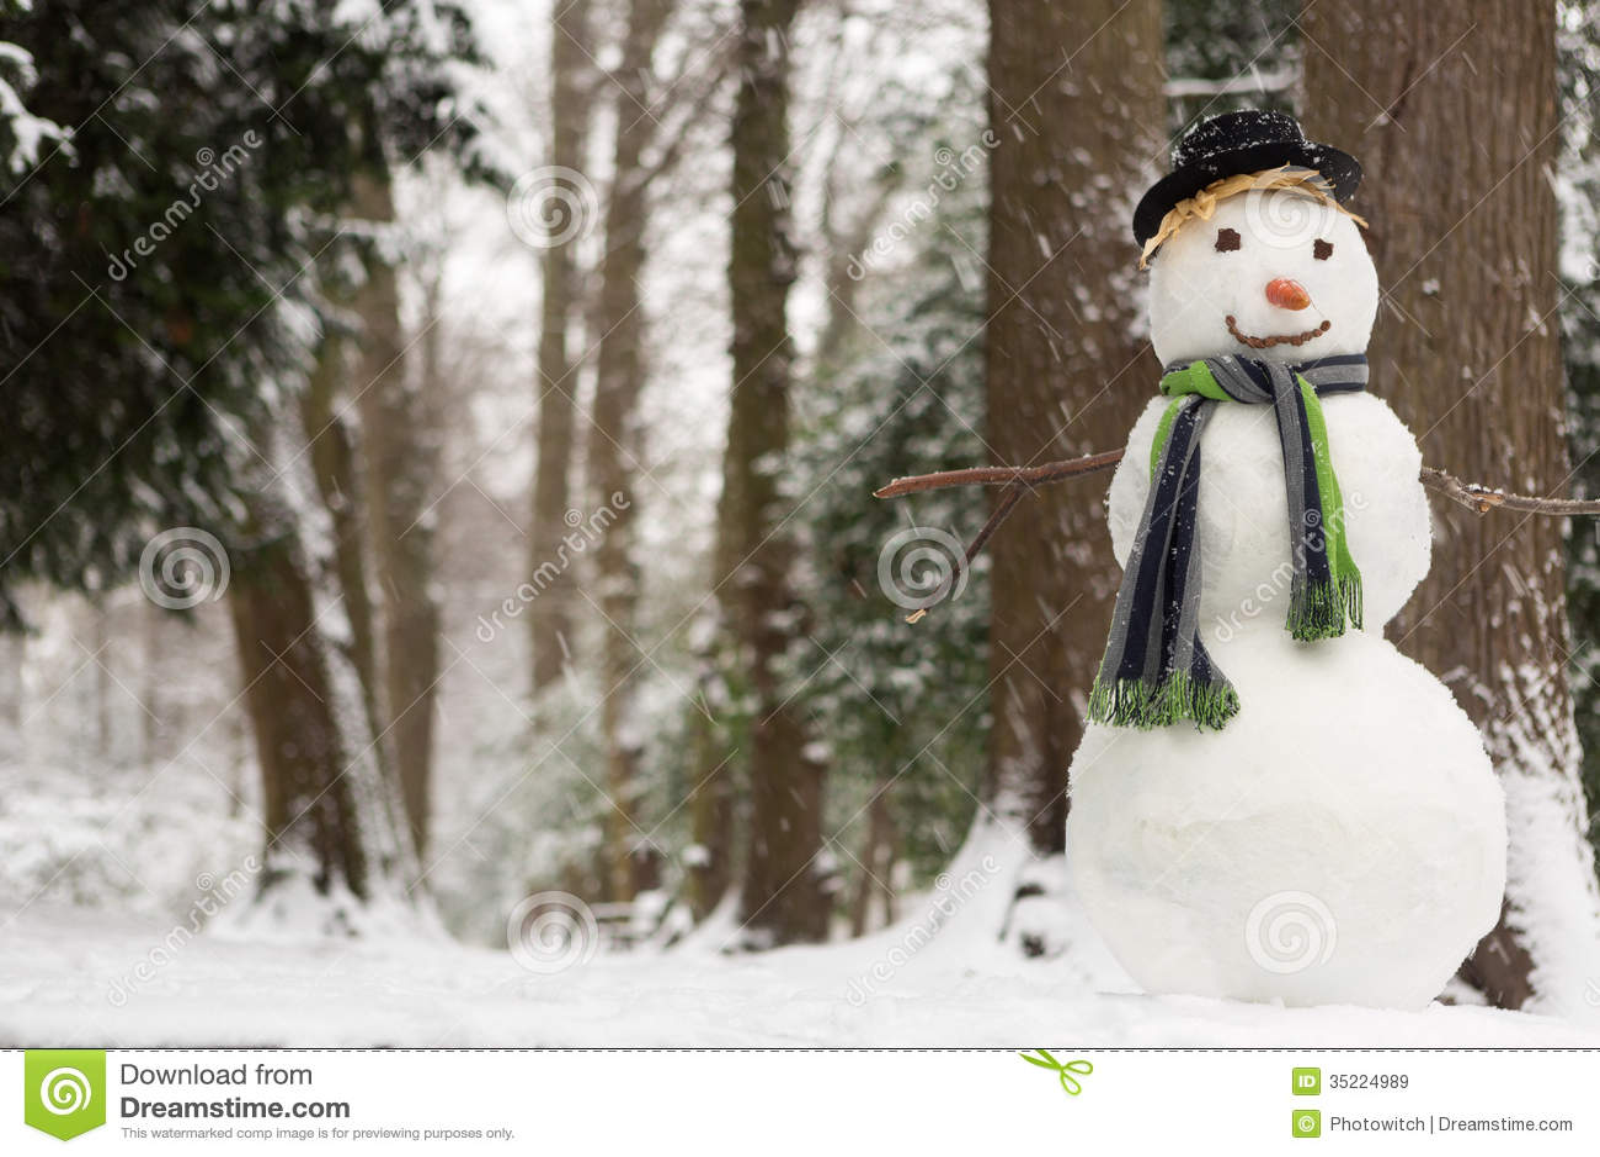 snowman - Ruth E. Hendricks Photography